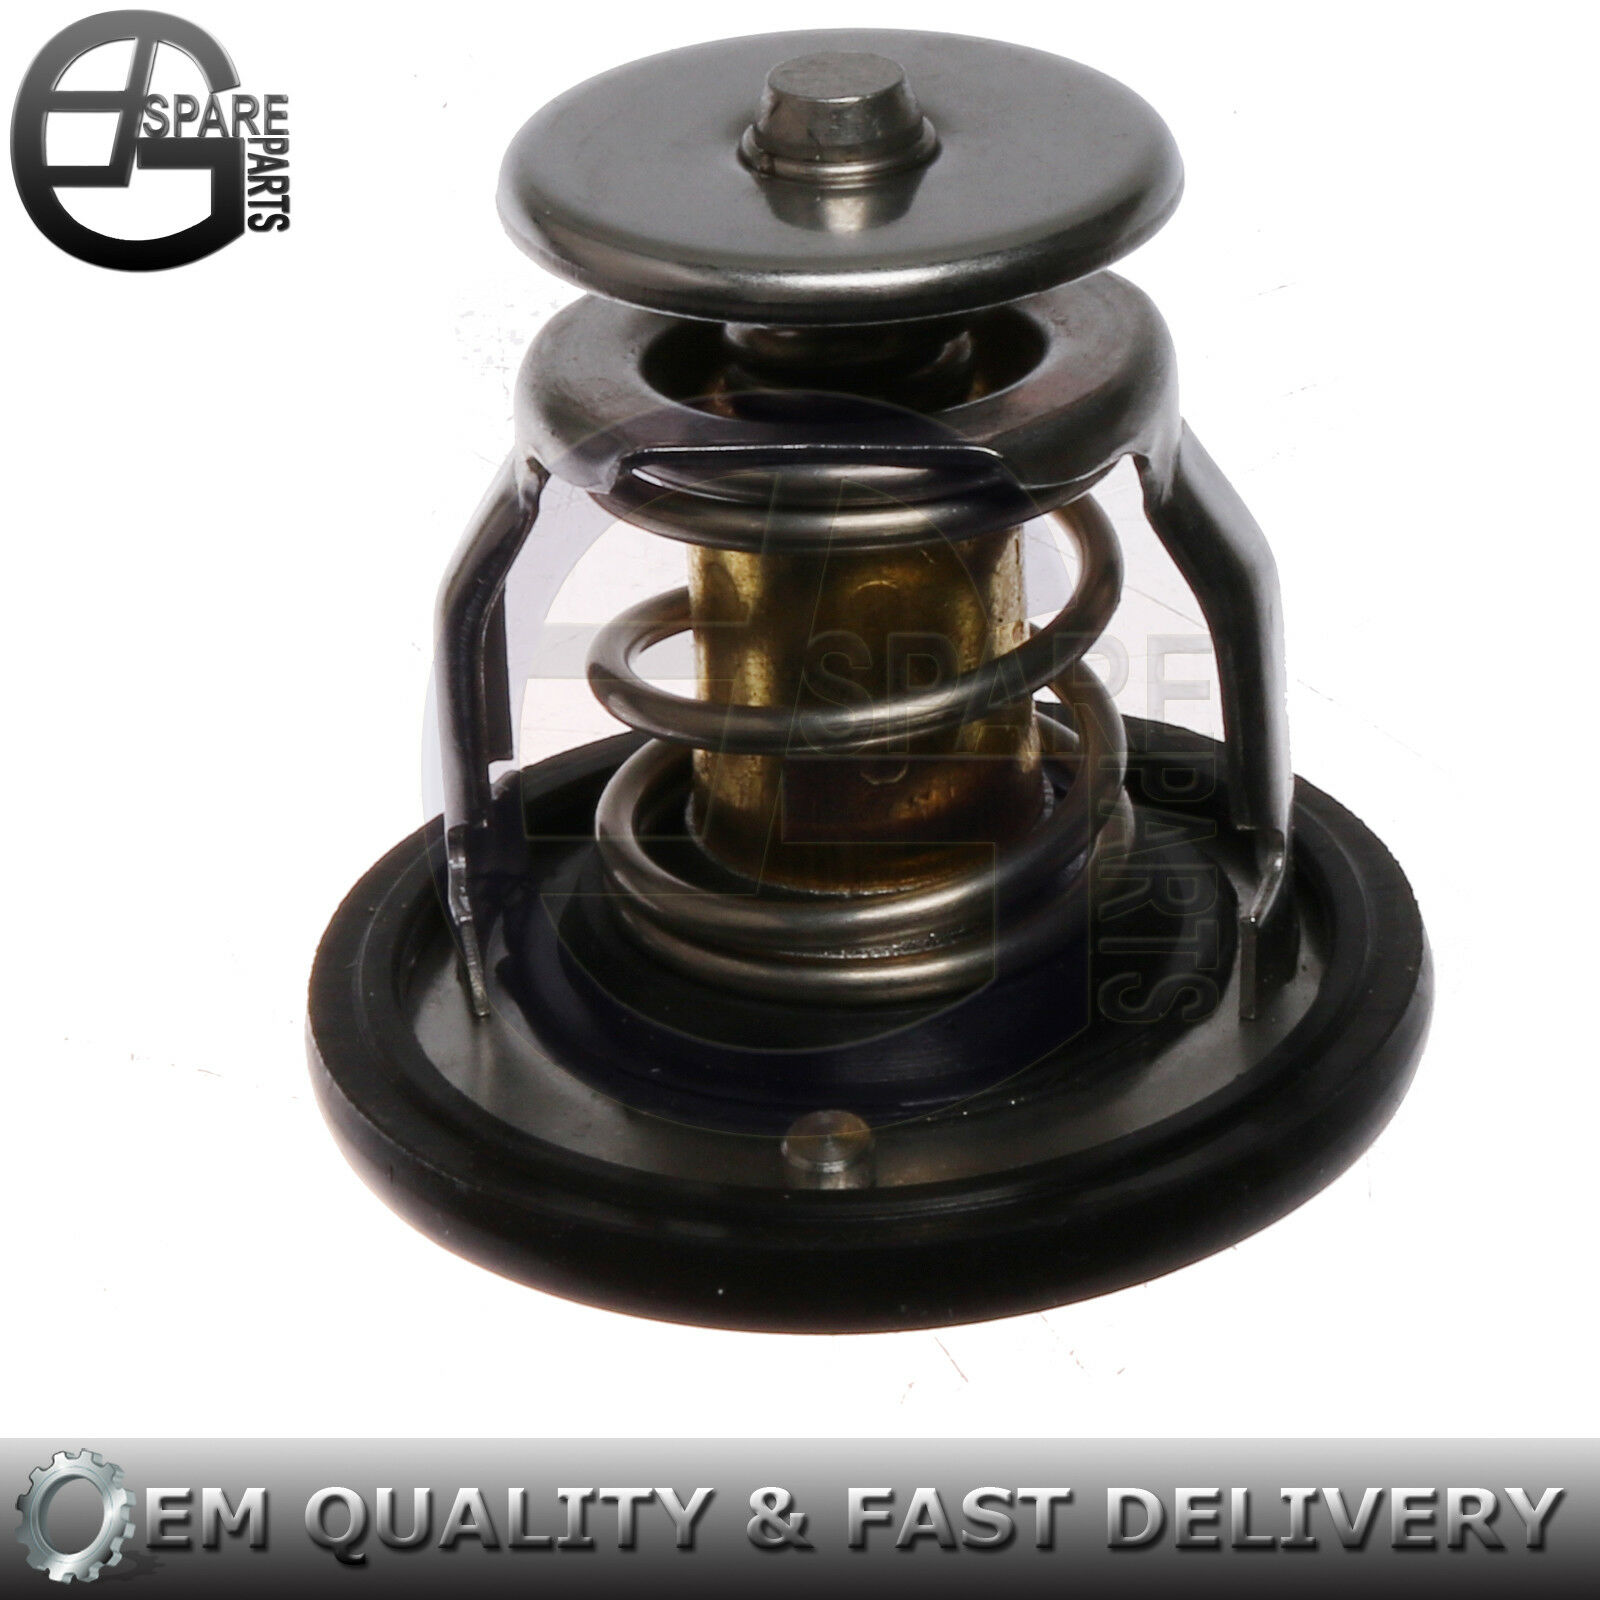 Thermostat Fit for Mustang Skid Steer 2040 2042 Deere Yanmar 3245c